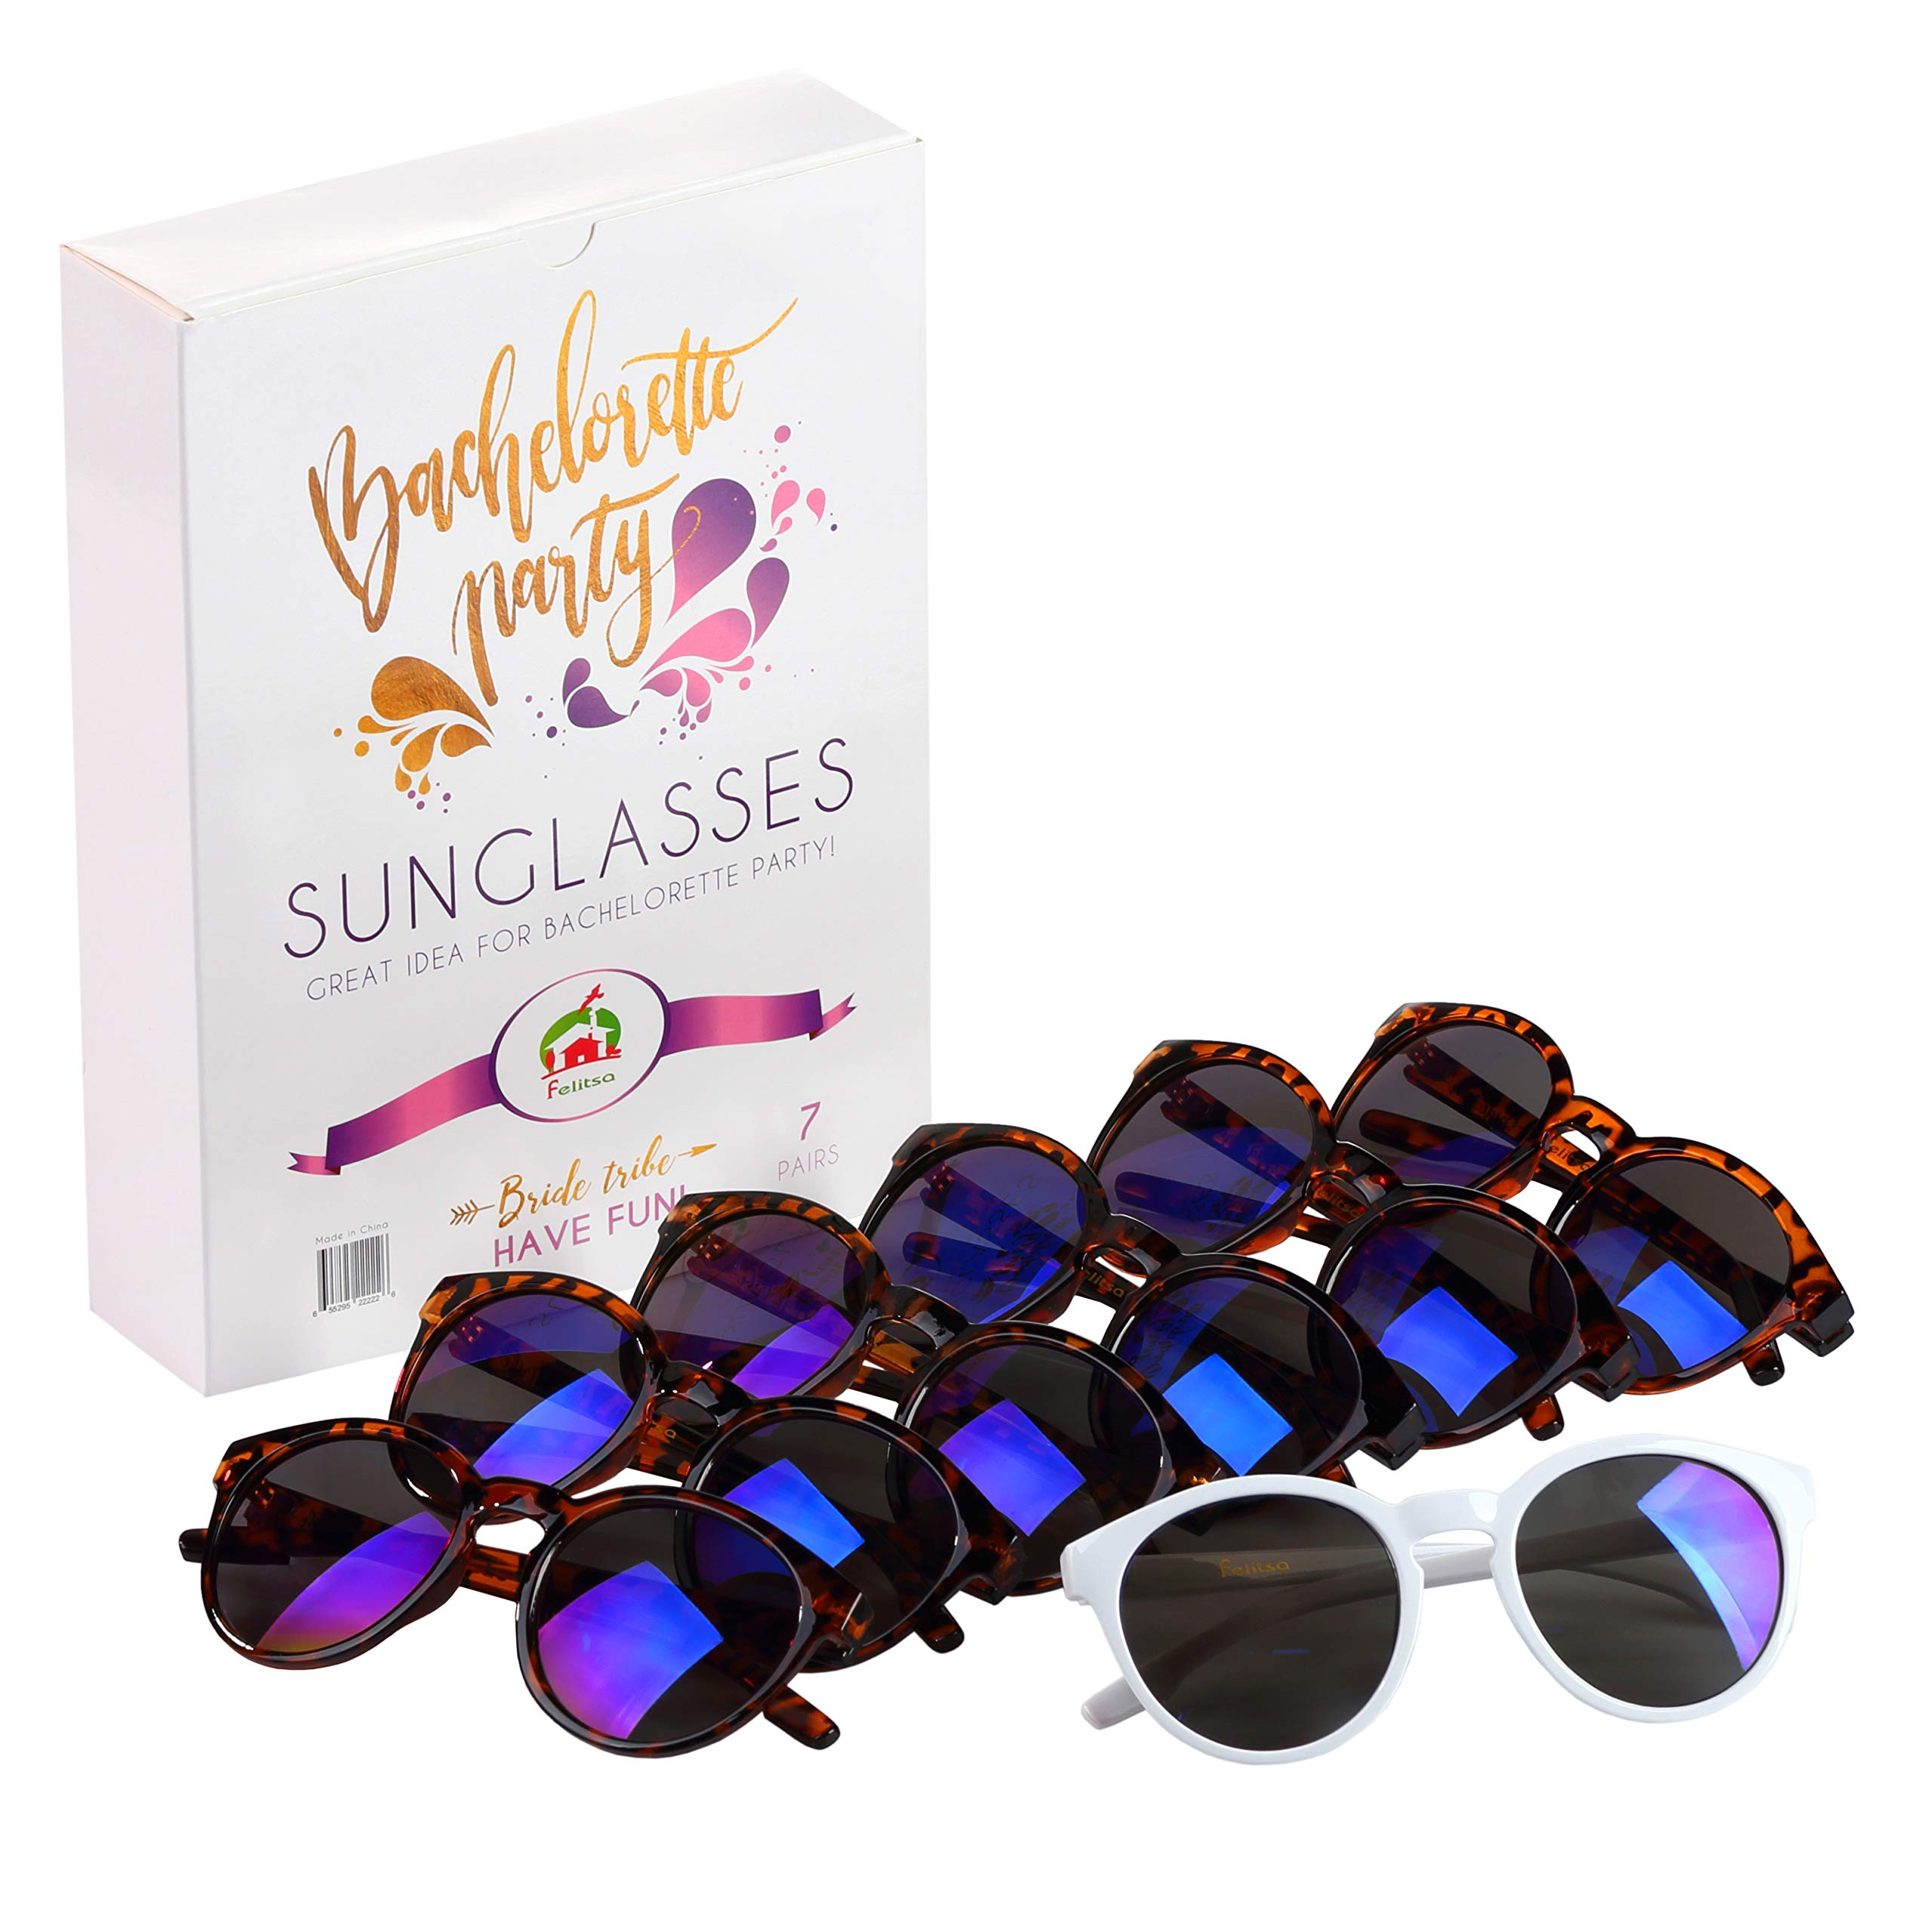 Felitsa Bachelorette Party Sunglasses - 7 Pairs of Bride Tribe Glasses - Perfect for Bridesmaid Gifts, Bridal Shower and Bachelorette - Great bachelorette party decorations by Felitsa